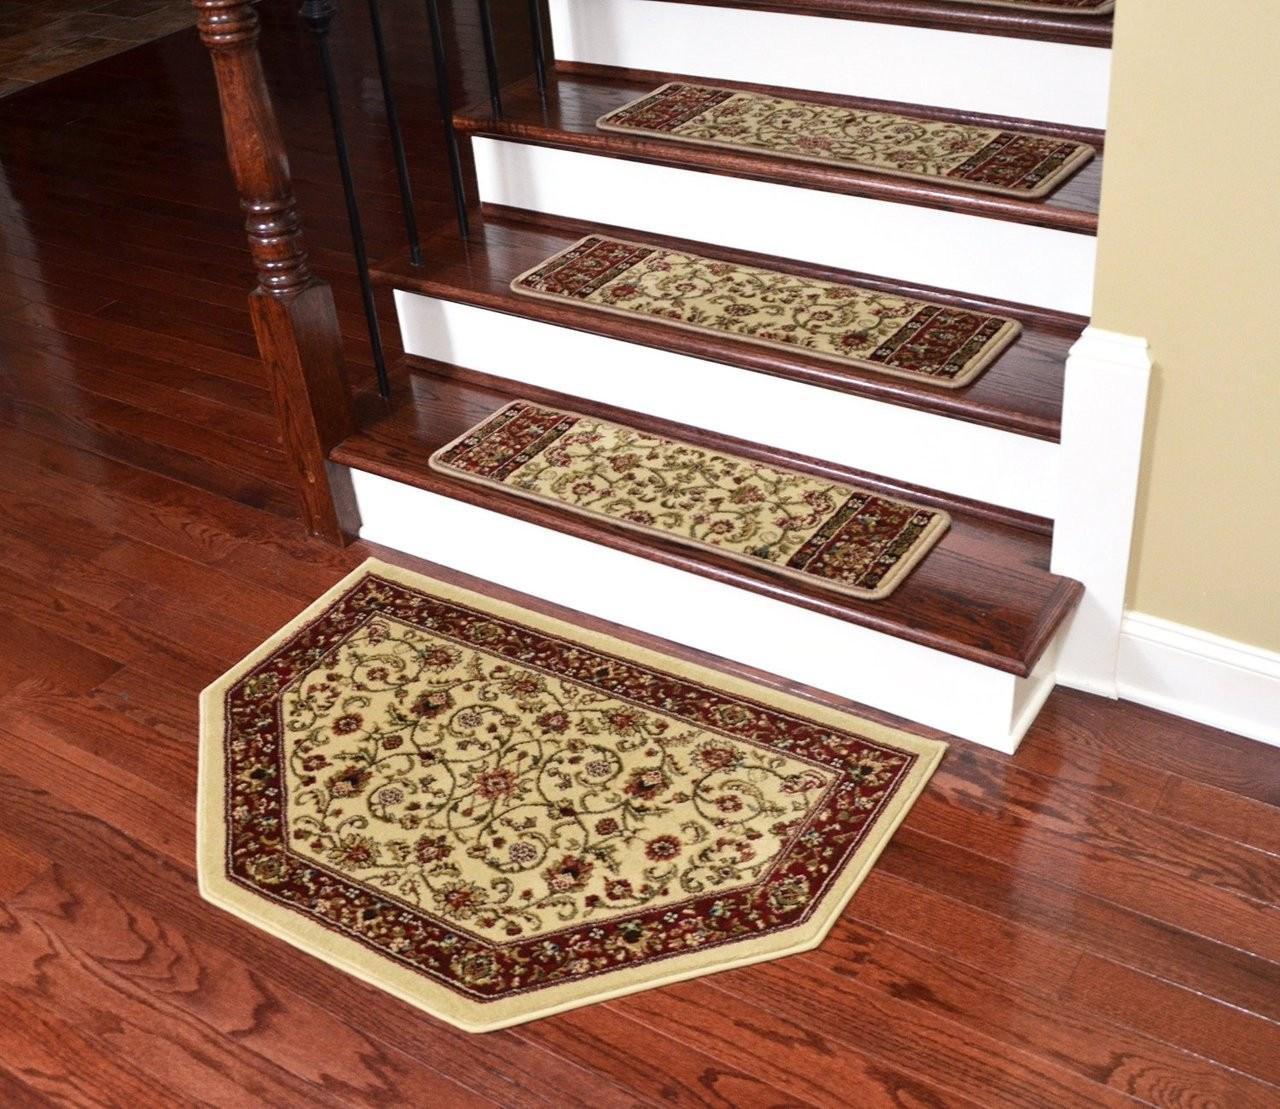 Dean Non Slip Pet Friendly Carpet Stair Step Cover Treads   Stairs And Landing Carpet Price   Measure   Landing Mat   Hallway   Grey   Stair Runner